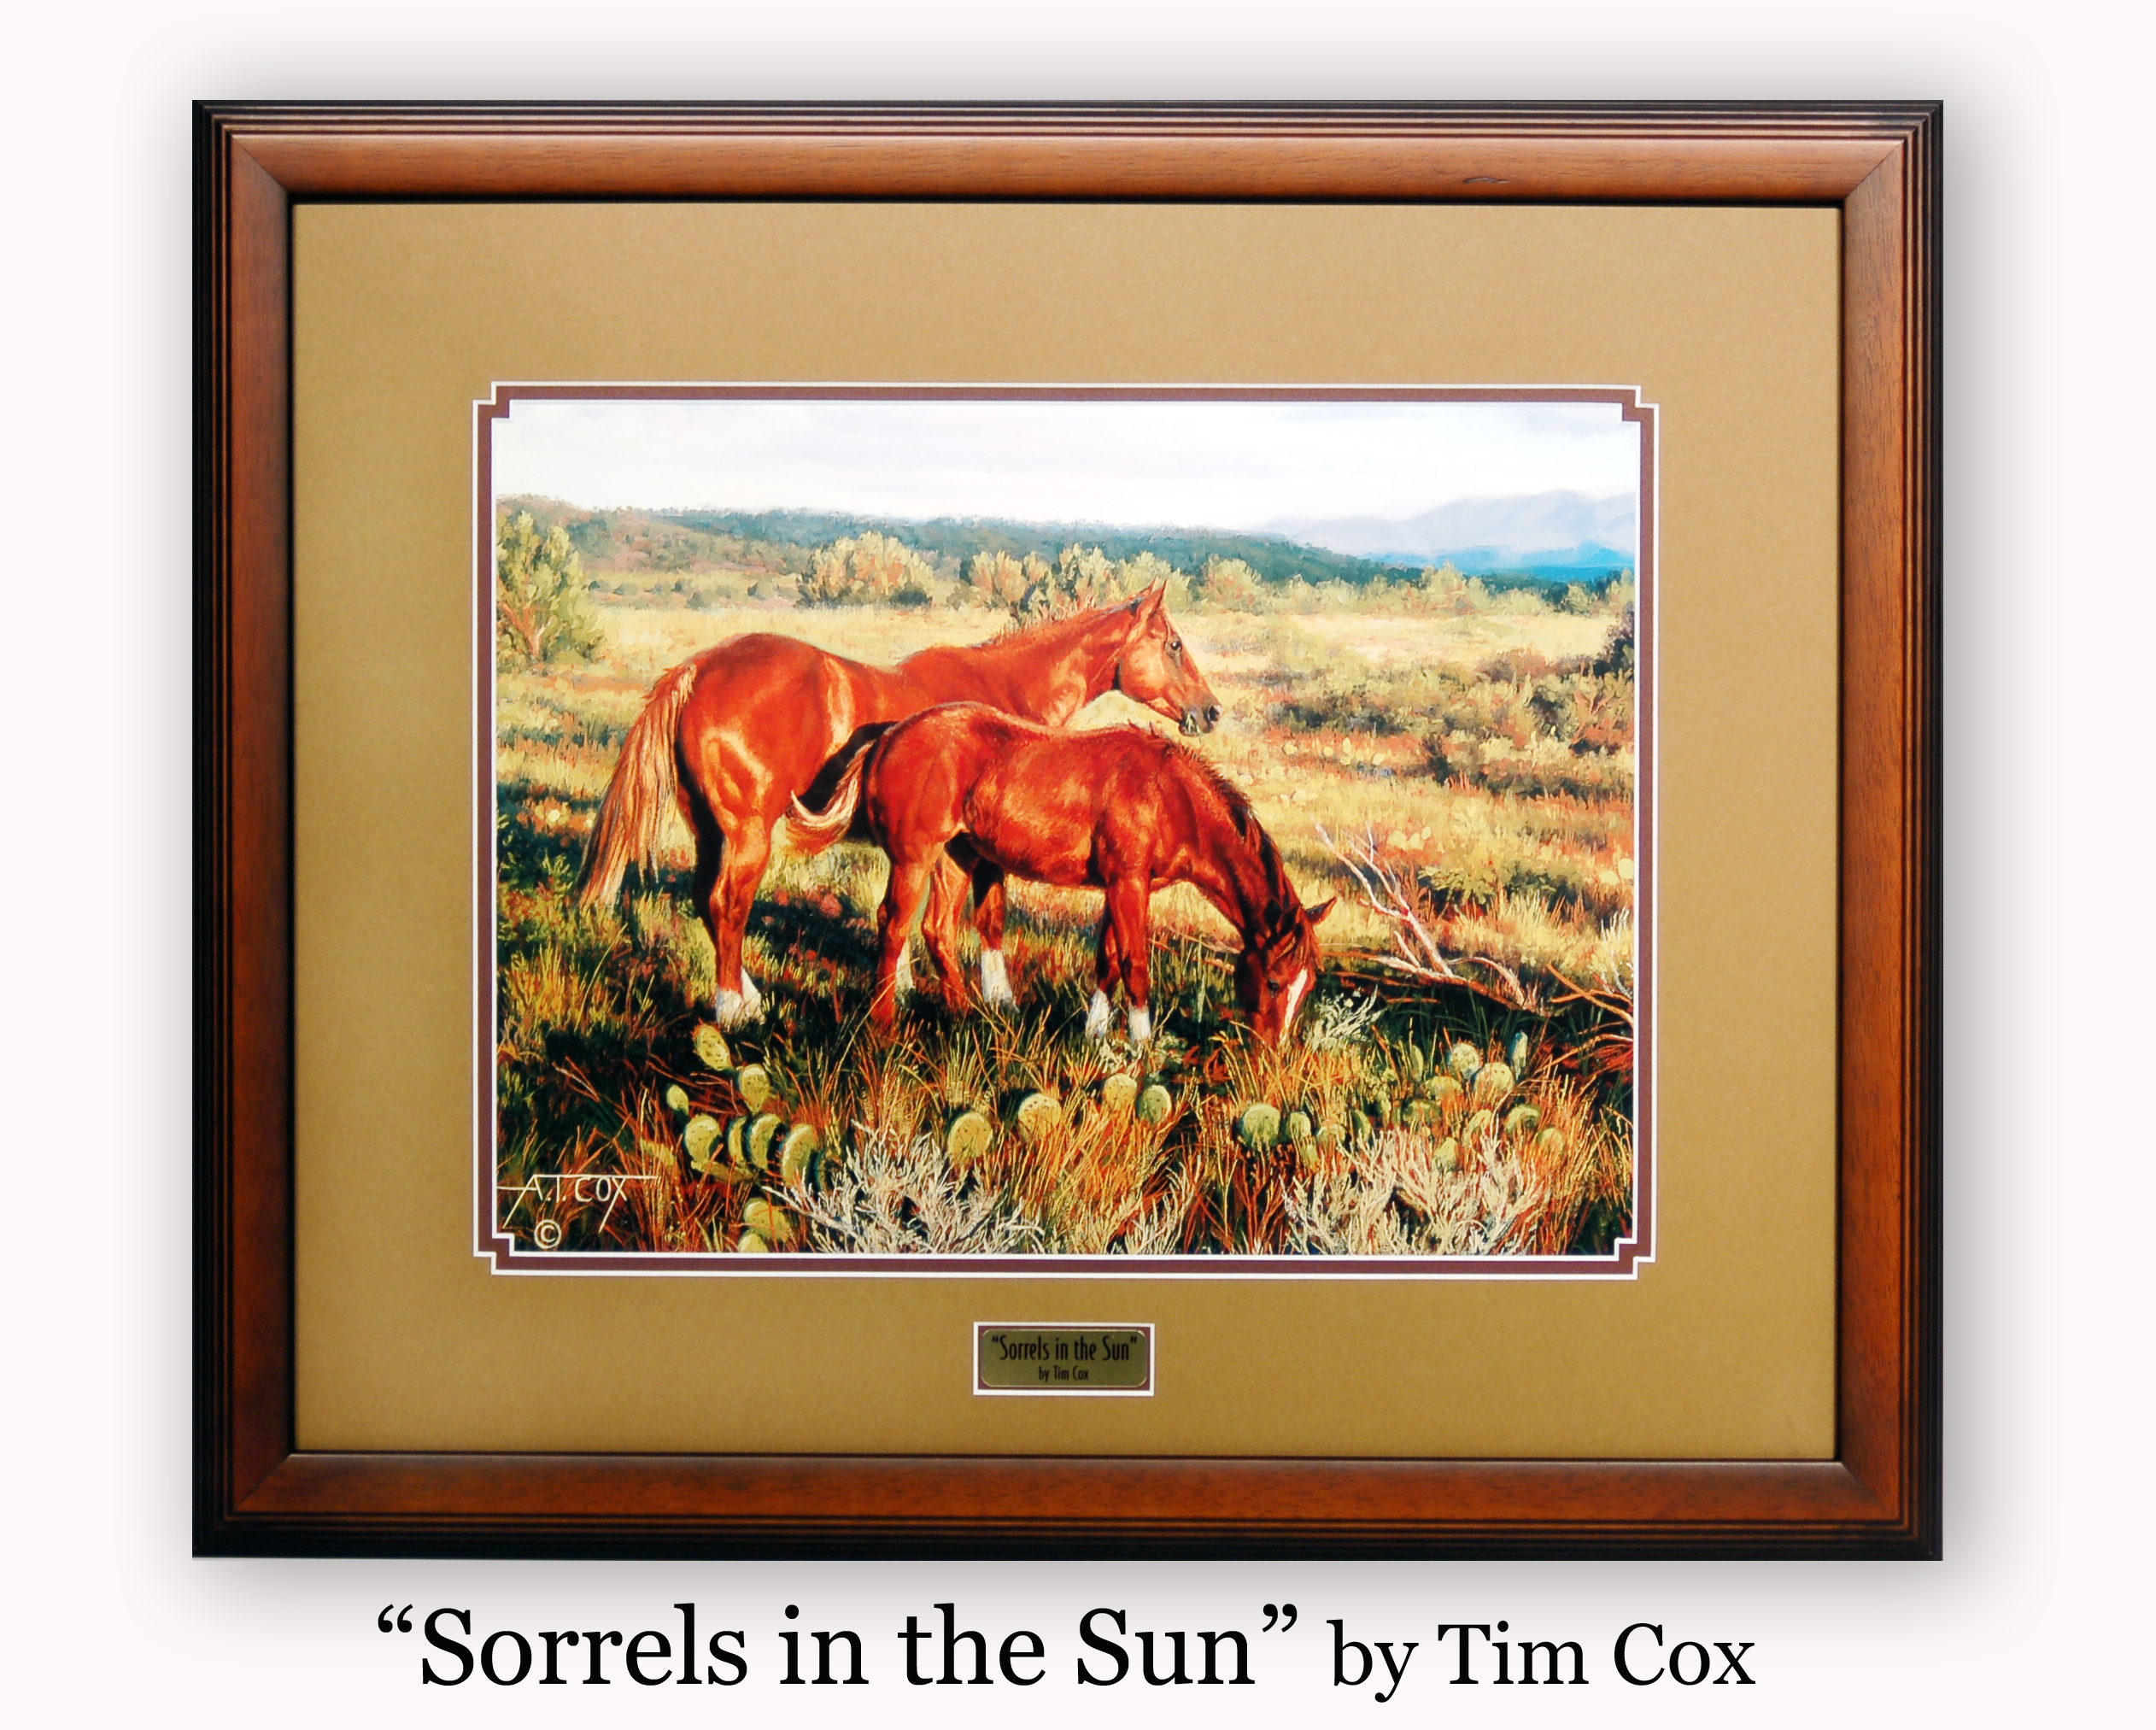 """Sorrels in the Sun by Tim Cox"